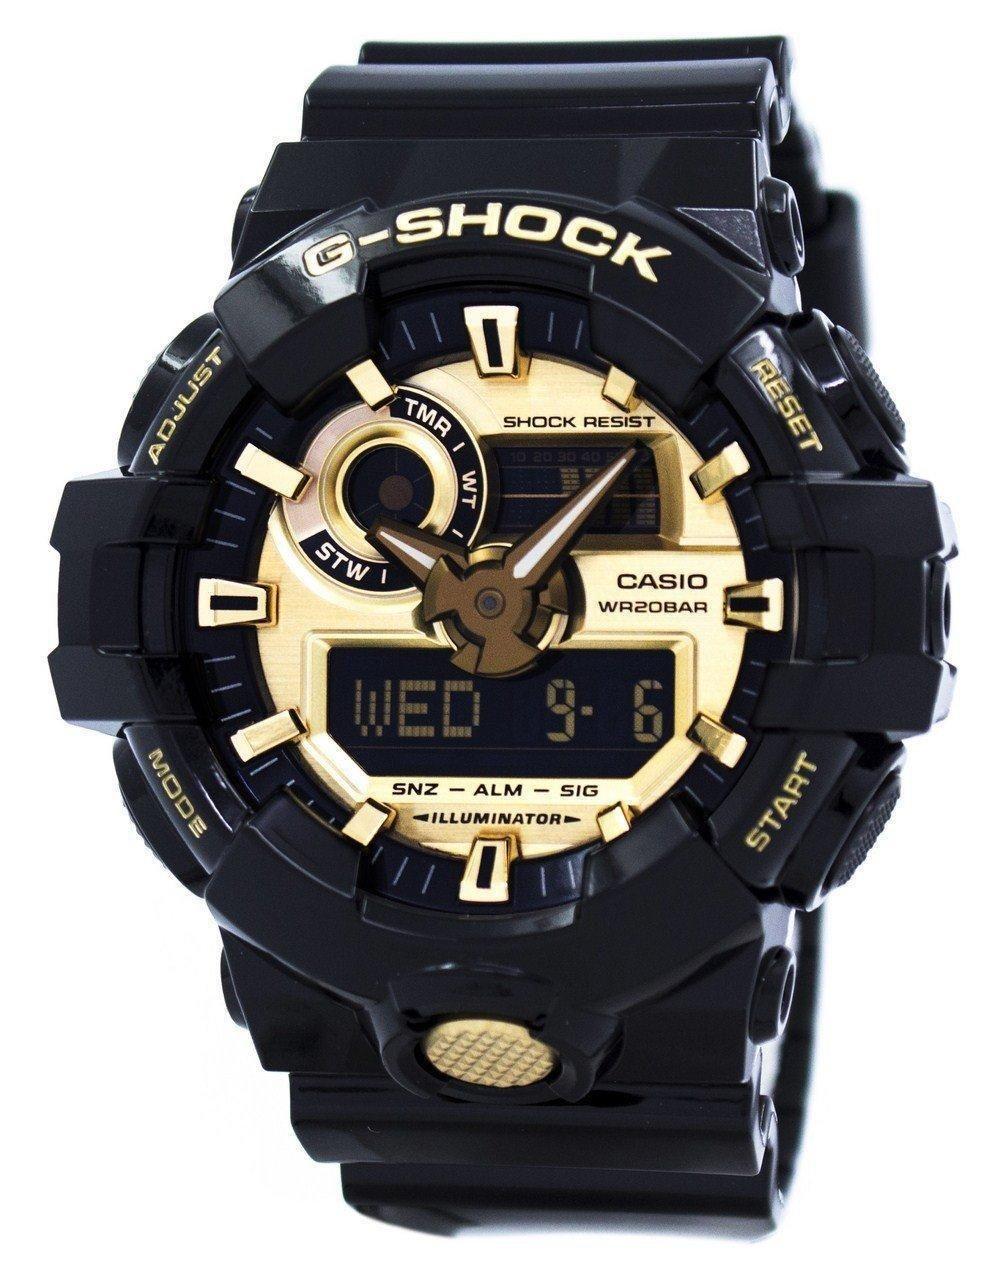 67d81ac0b Casio G-shock Analog Digital 200m Ga-710gb-1a Men's Watch (FREE Shipping)